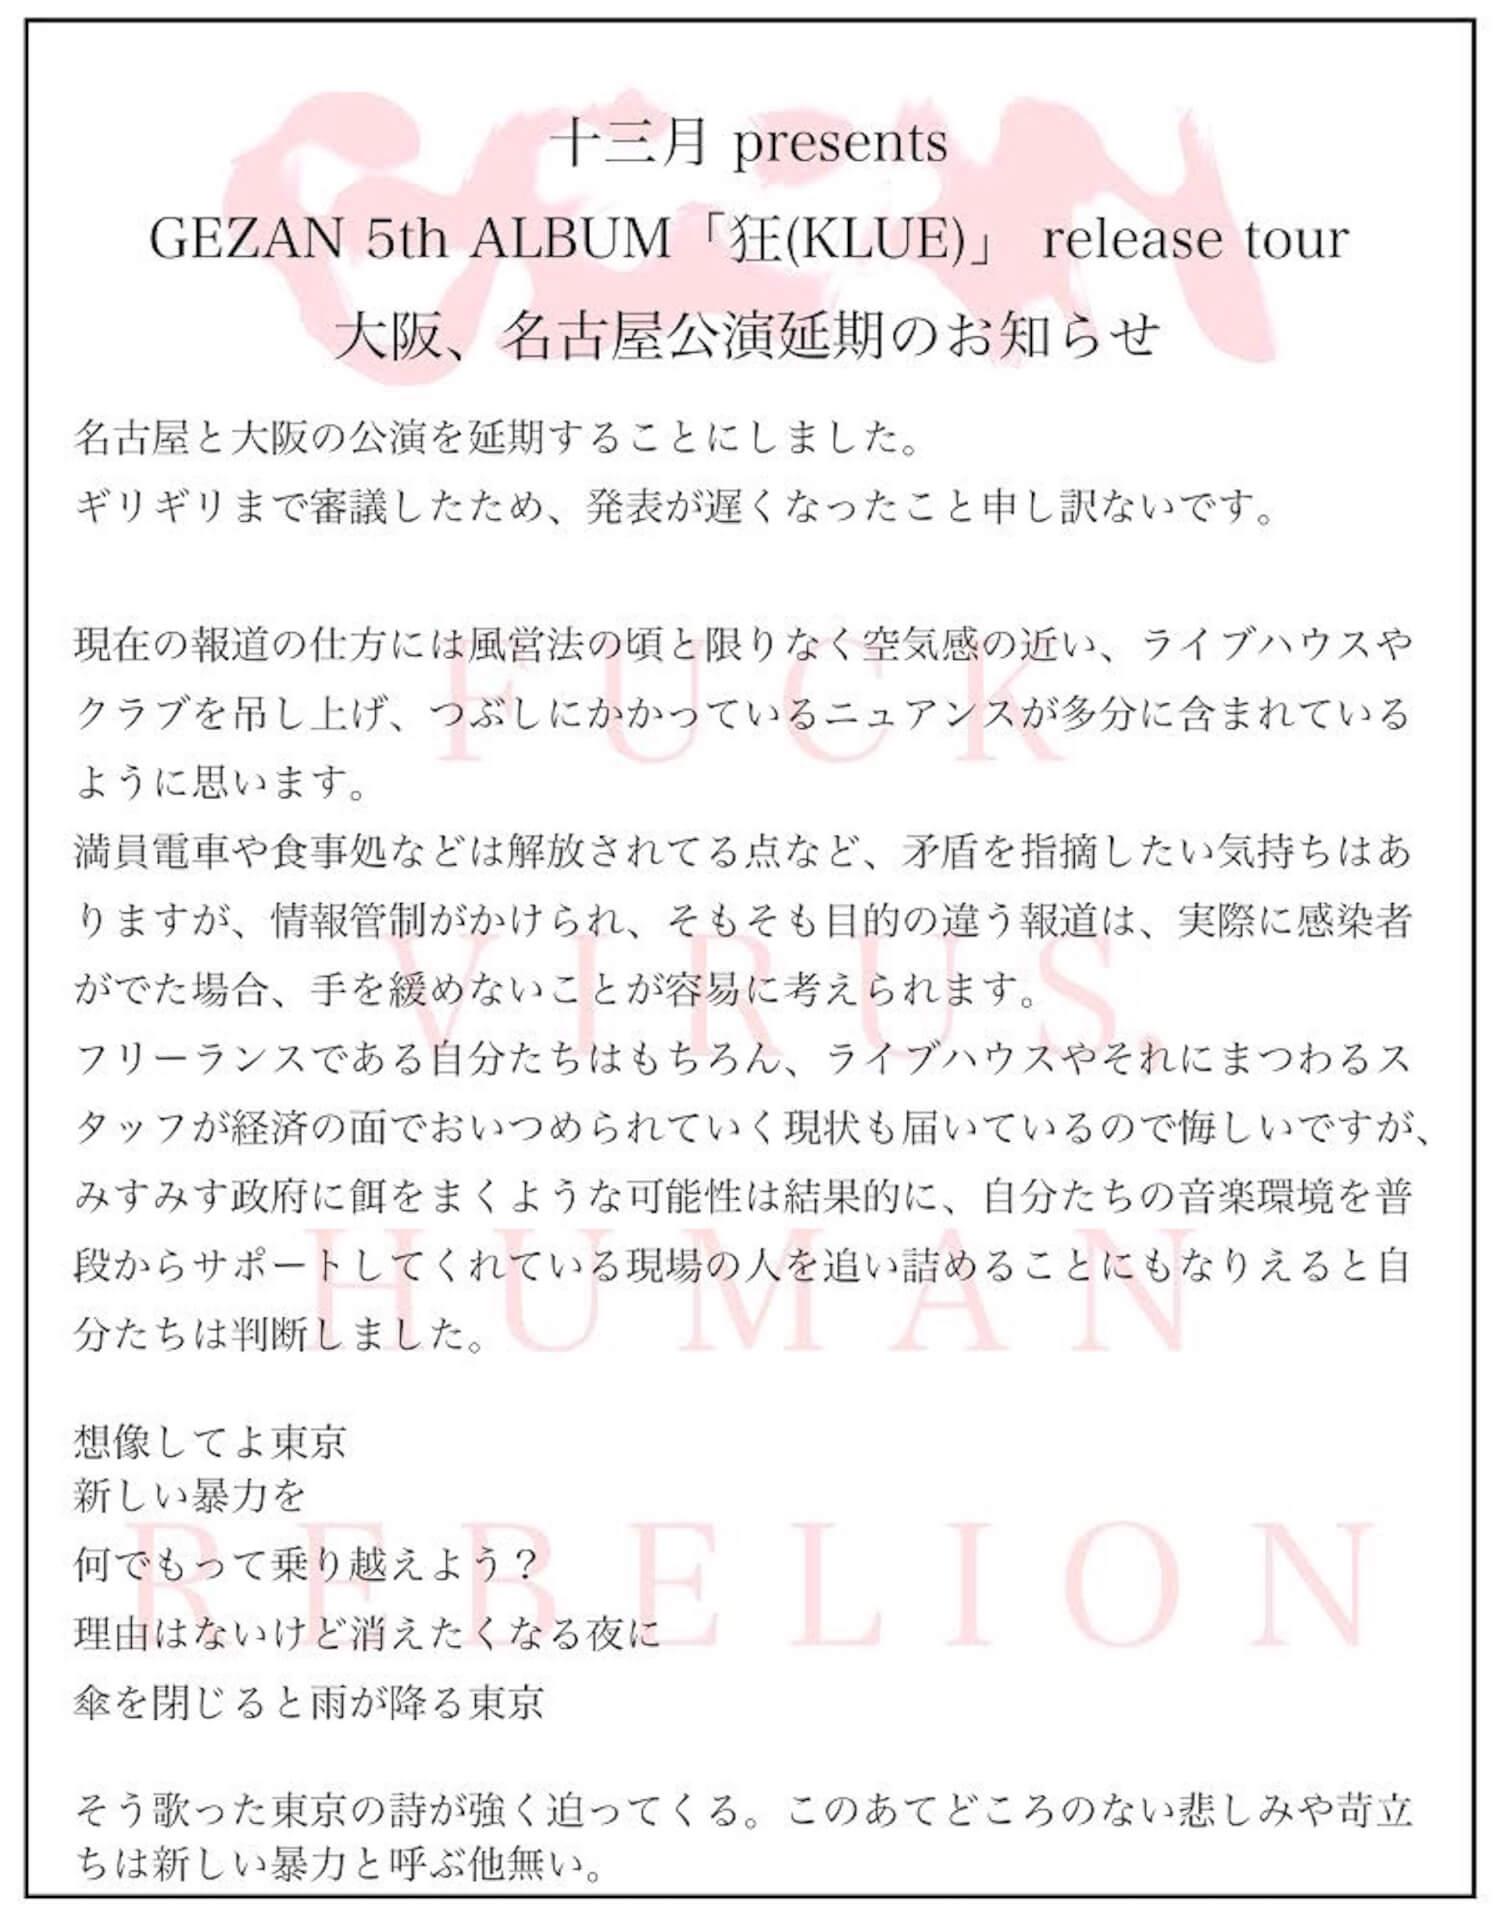 GEZAN『狂(KLUE)』リリースツアーの大阪・名古屋公演が新型コロナウイルスのため延期に|6月に振替公演を予定 music0311_gezanhurikae_03